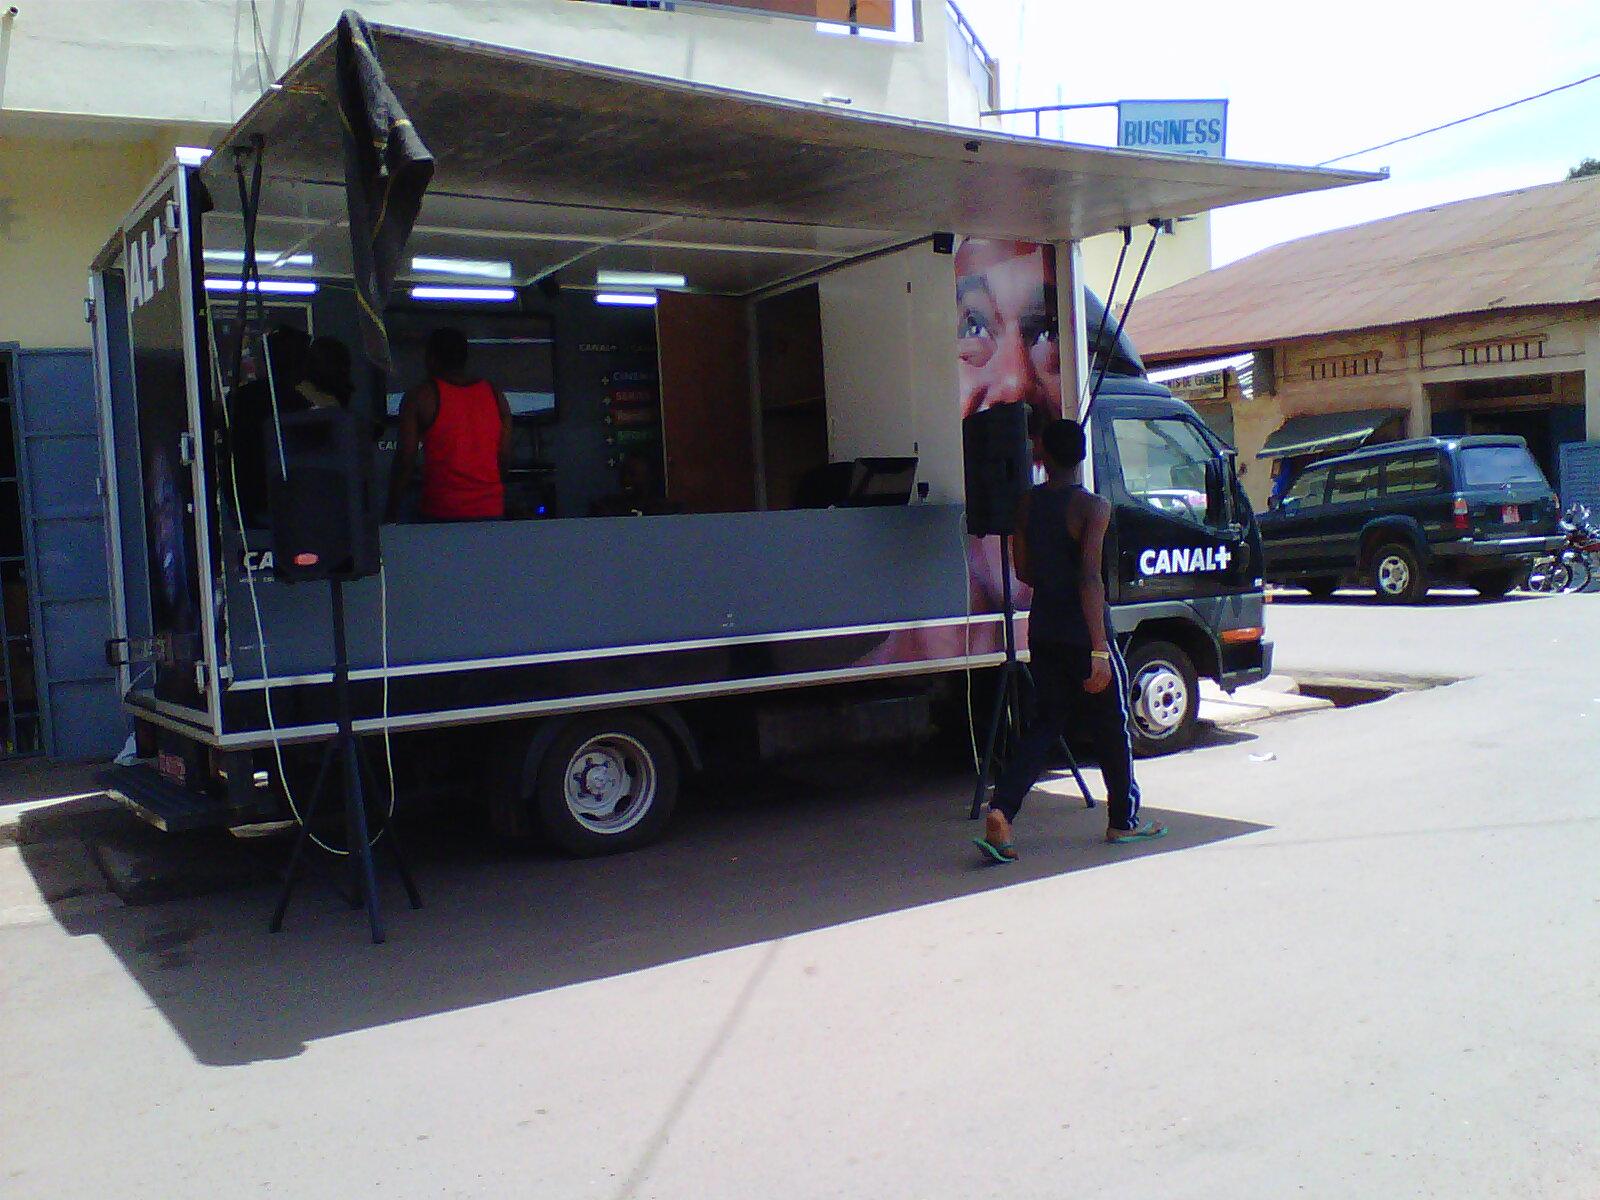 Une camionnette du groupe canal+ crédit photo :Sally Bilaly Sow